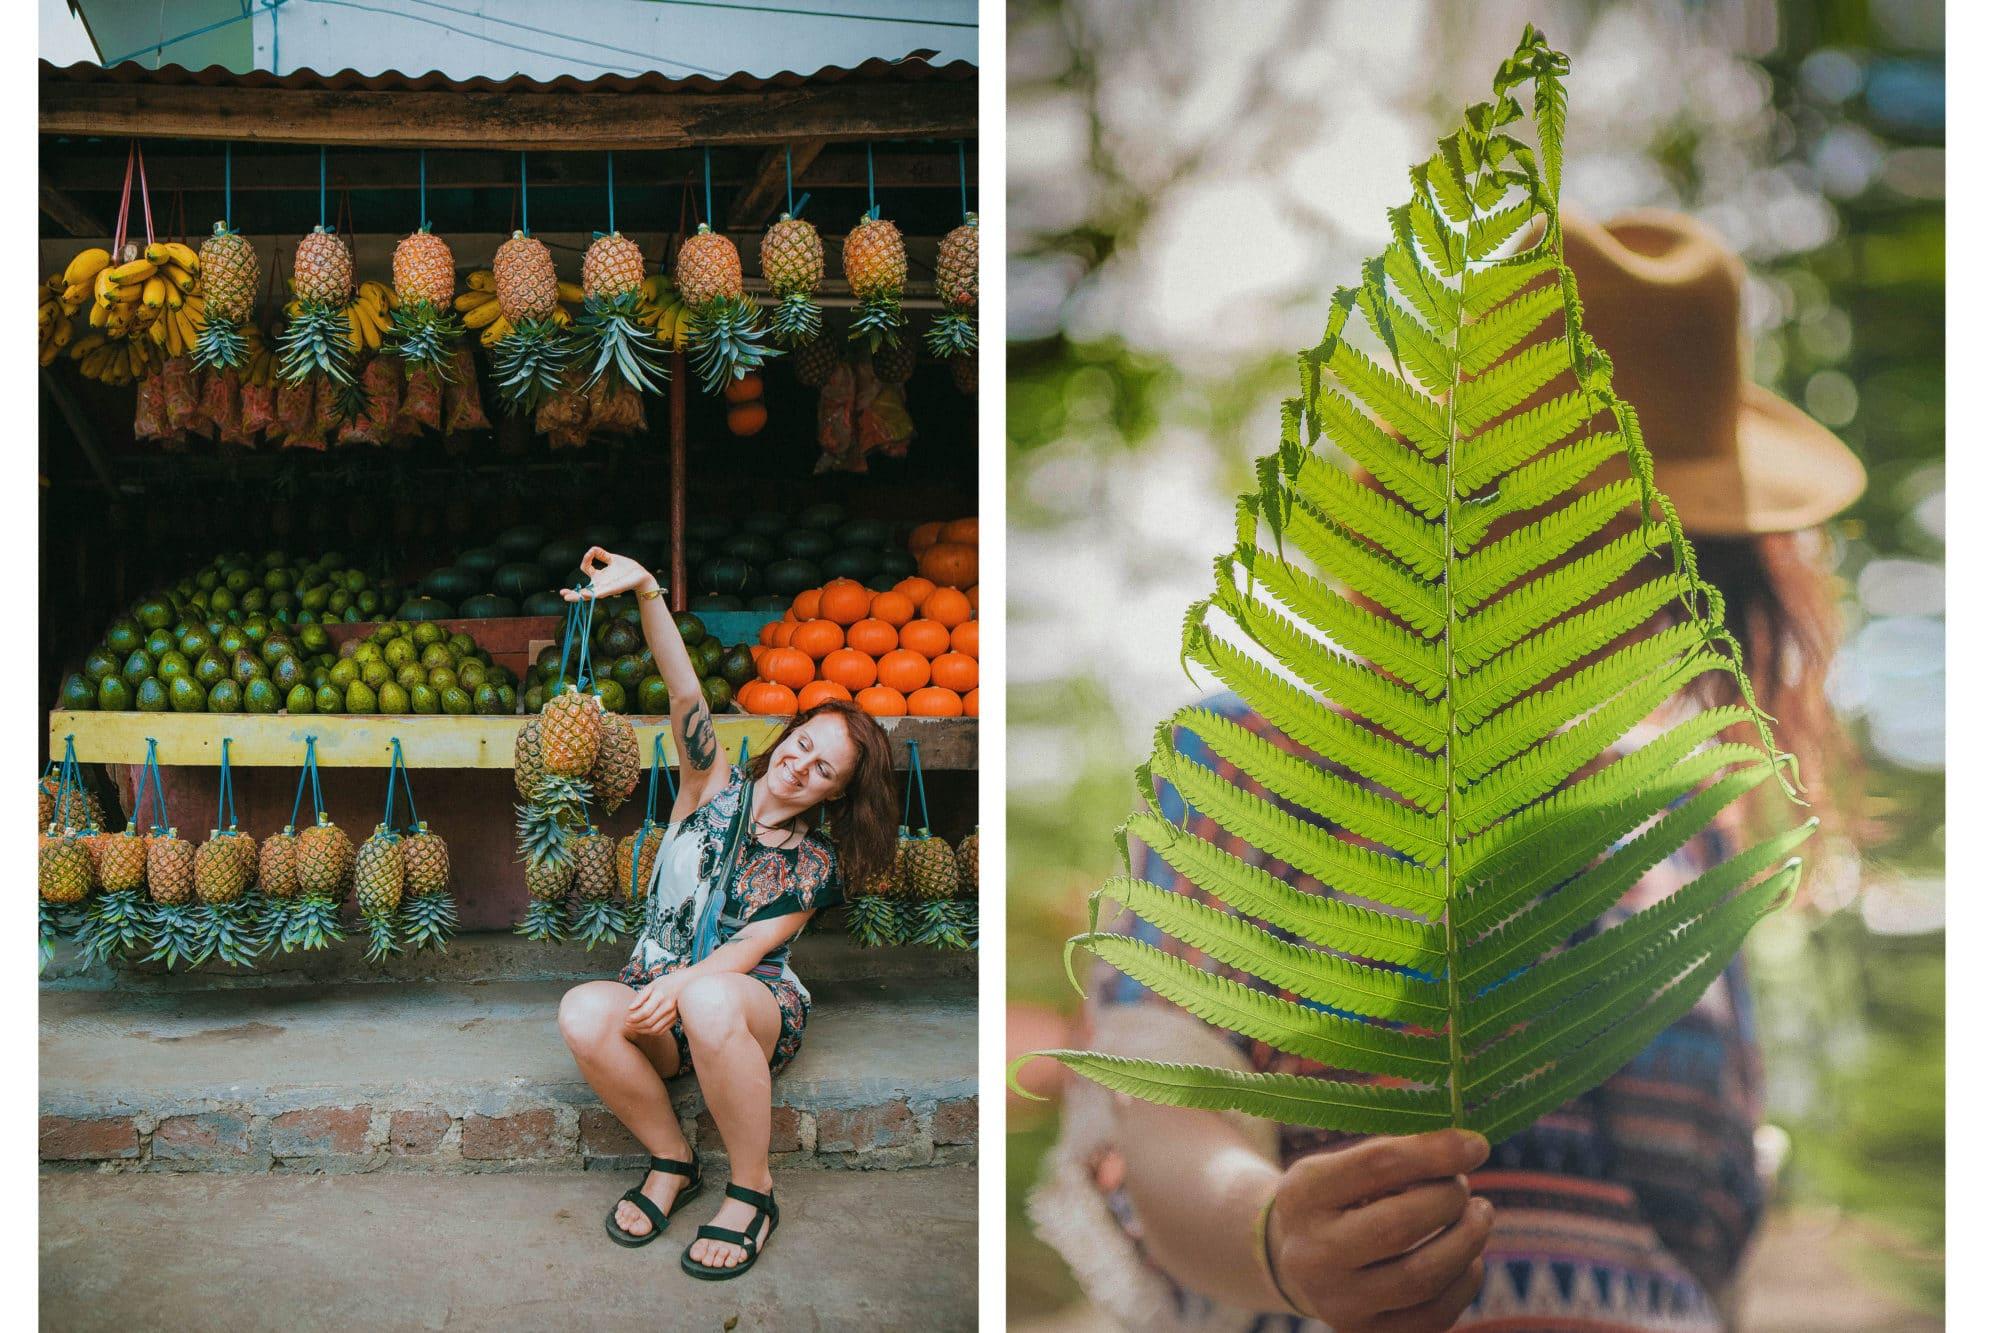 fruit stall bandung exploring leaf magic of plants hat colourful pineapple orange vegan